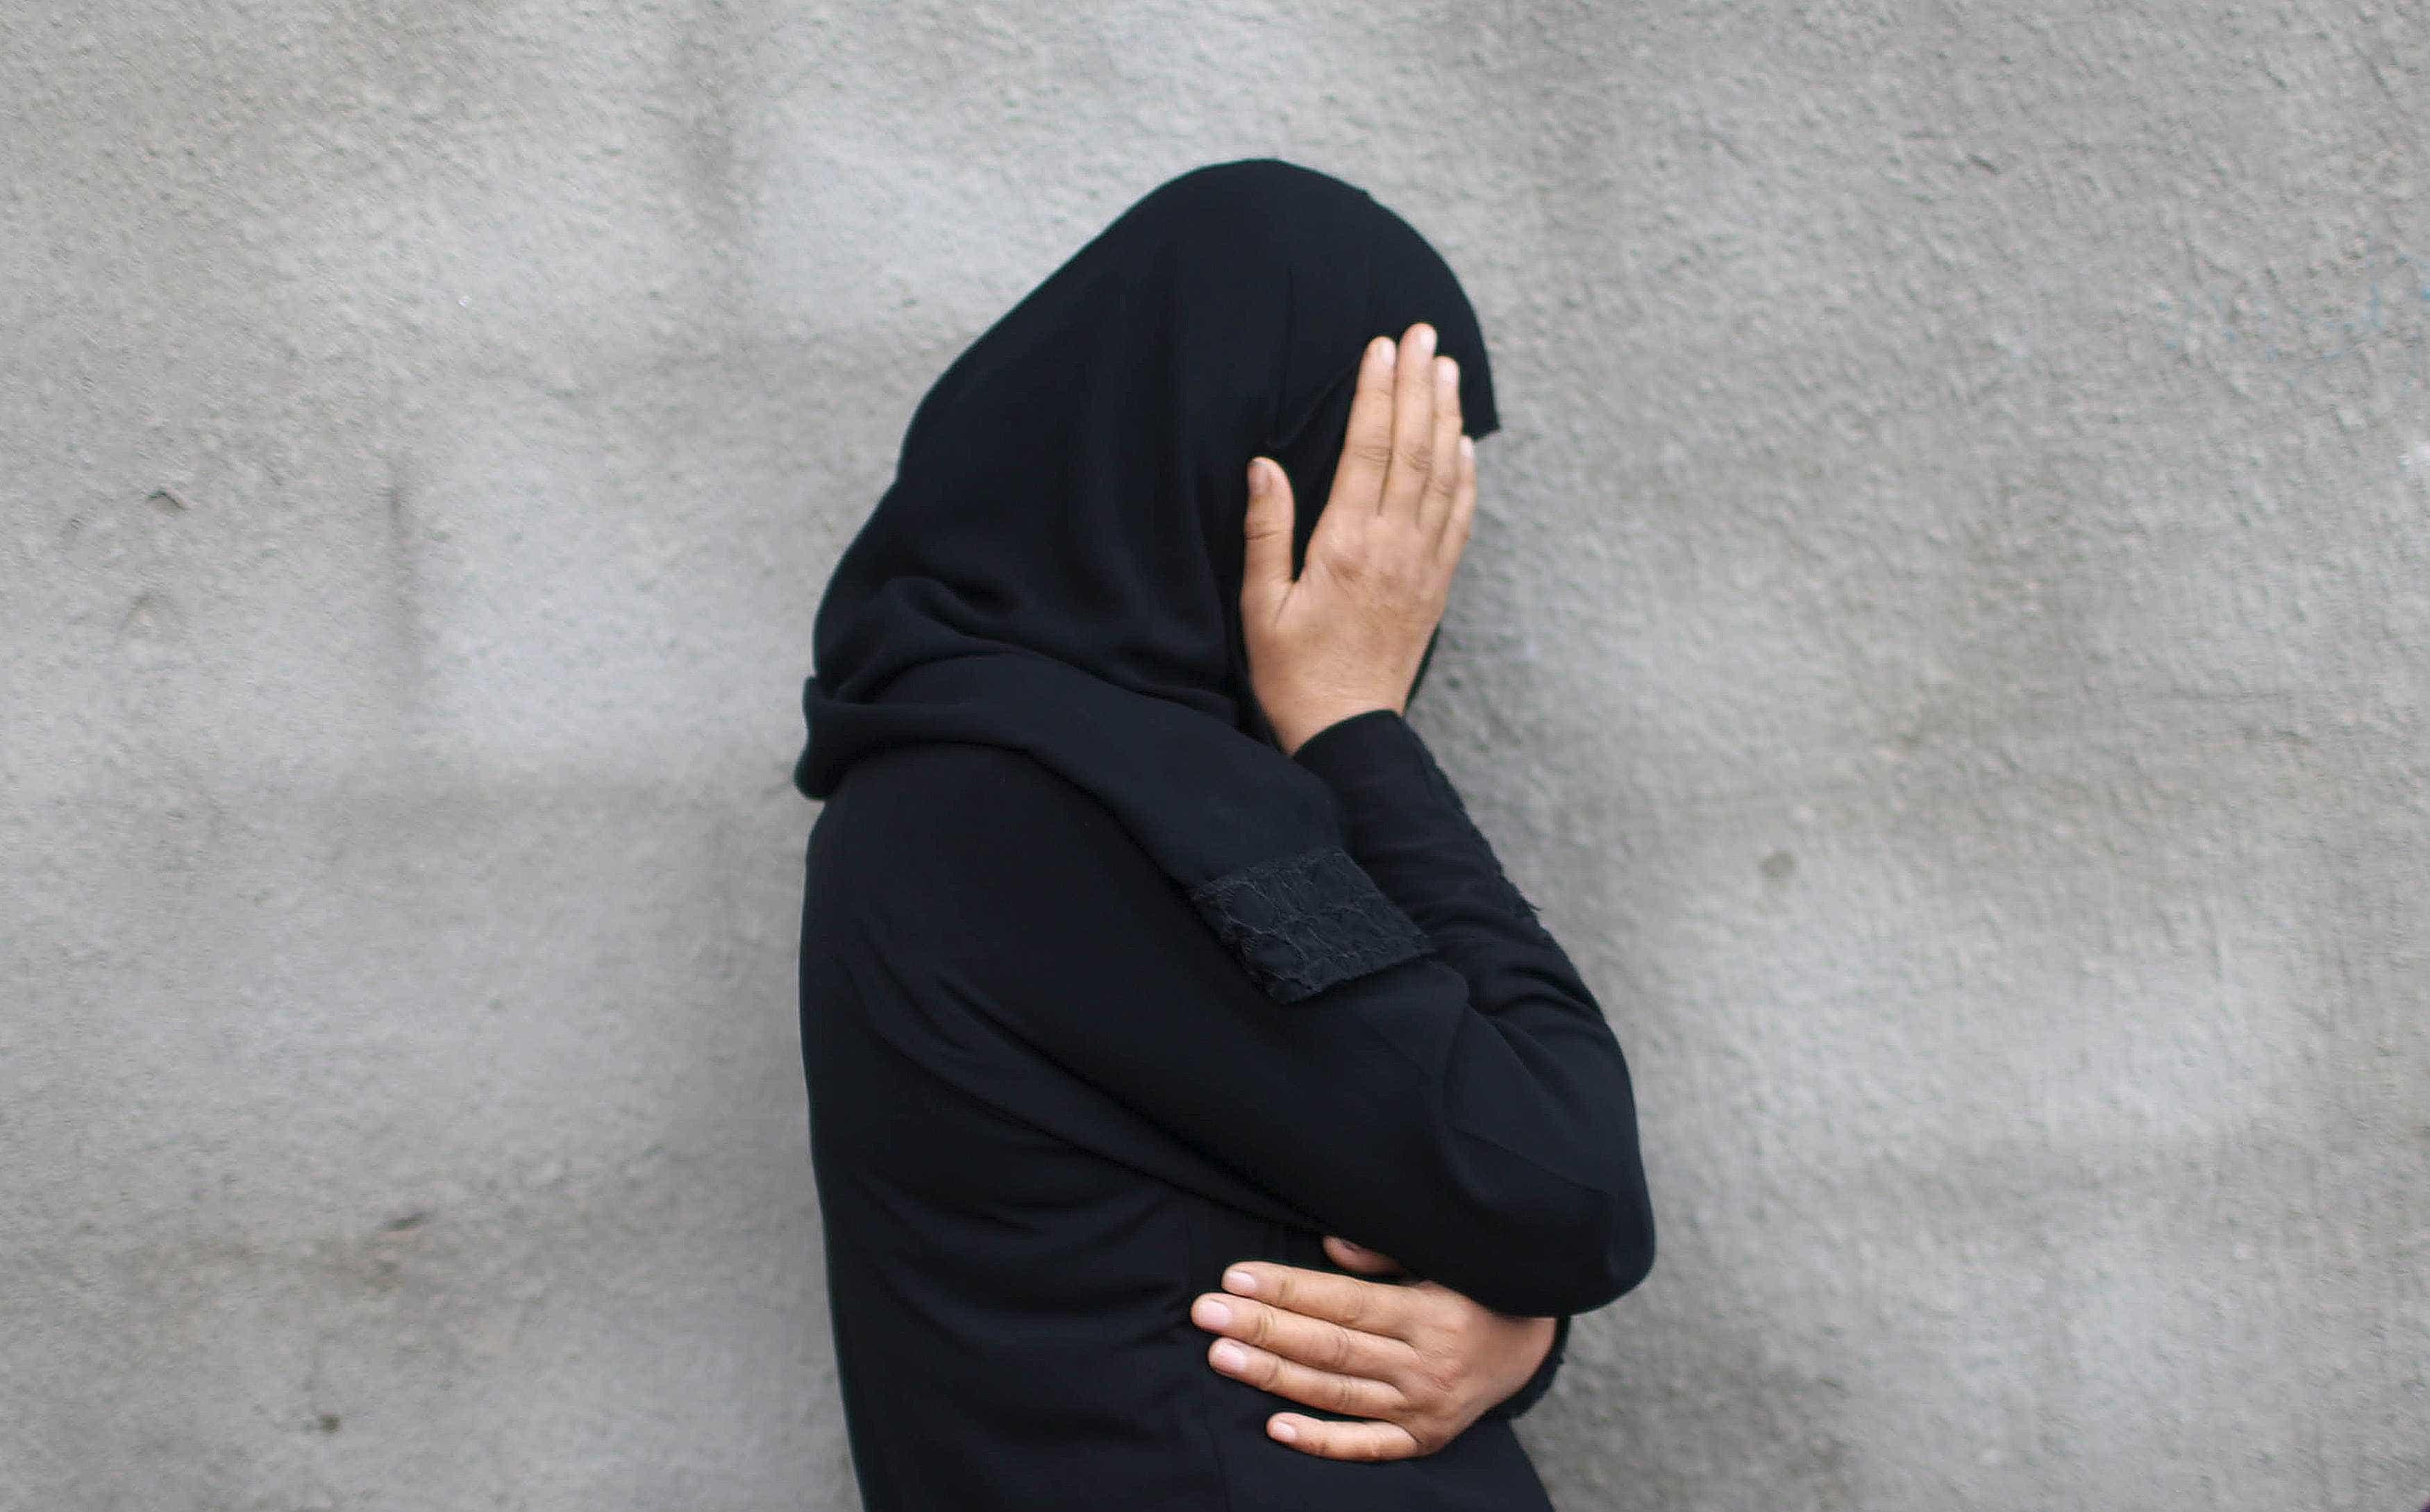 Portuguesa casada com jihadista acusa Governo de lhe virar as costas